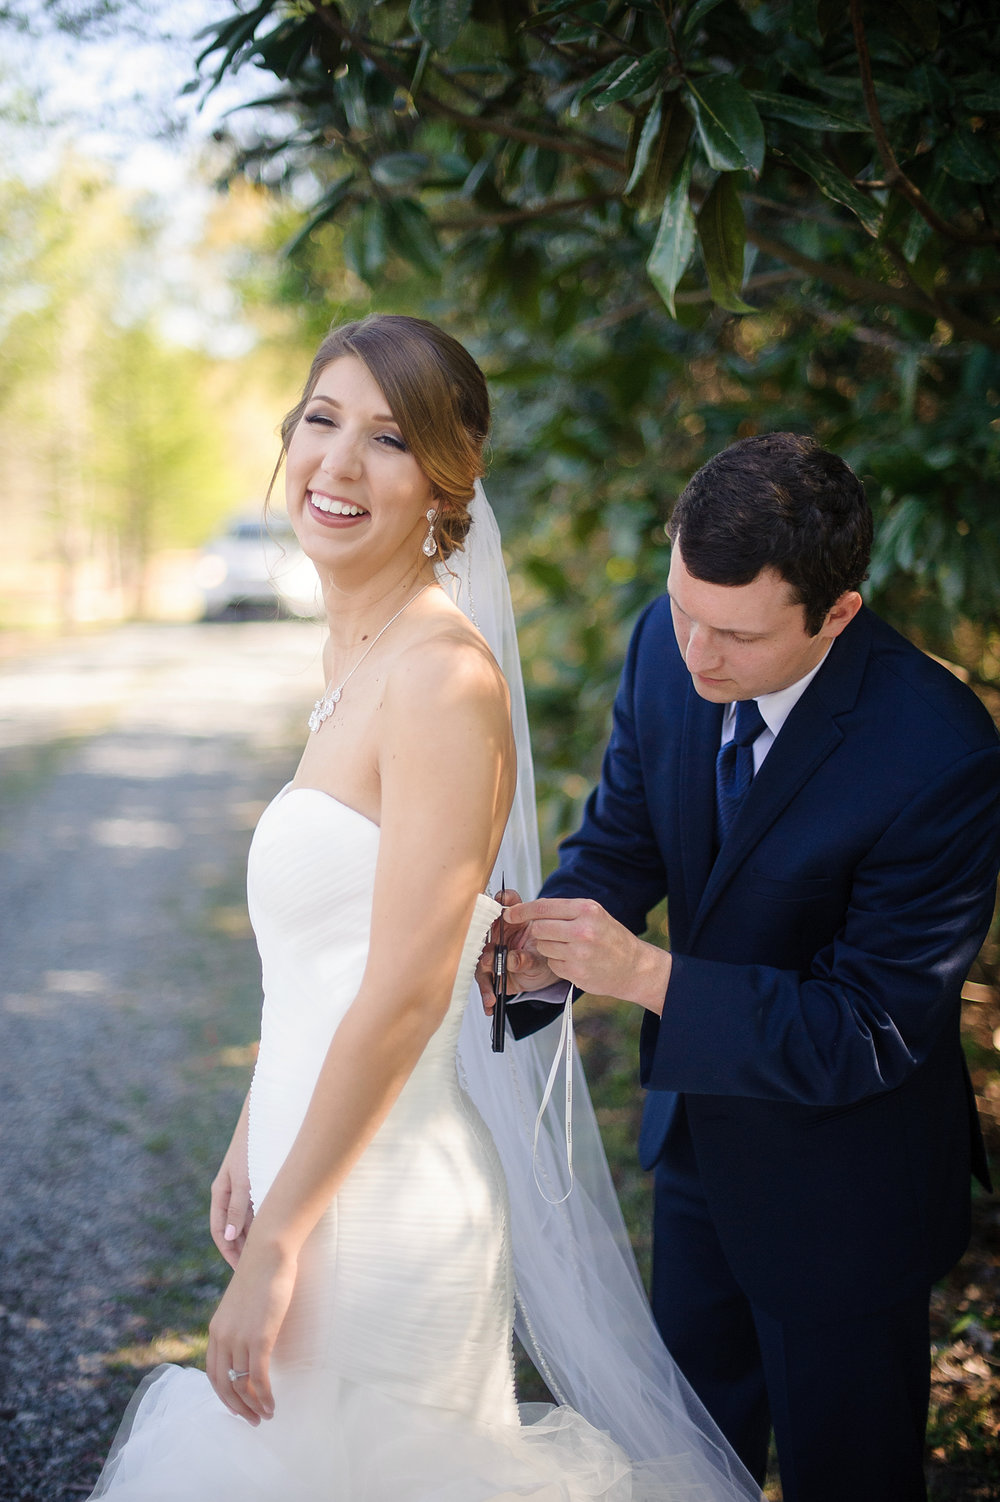 FIRST LOOK WEDDING PHOTOS-6.JPG